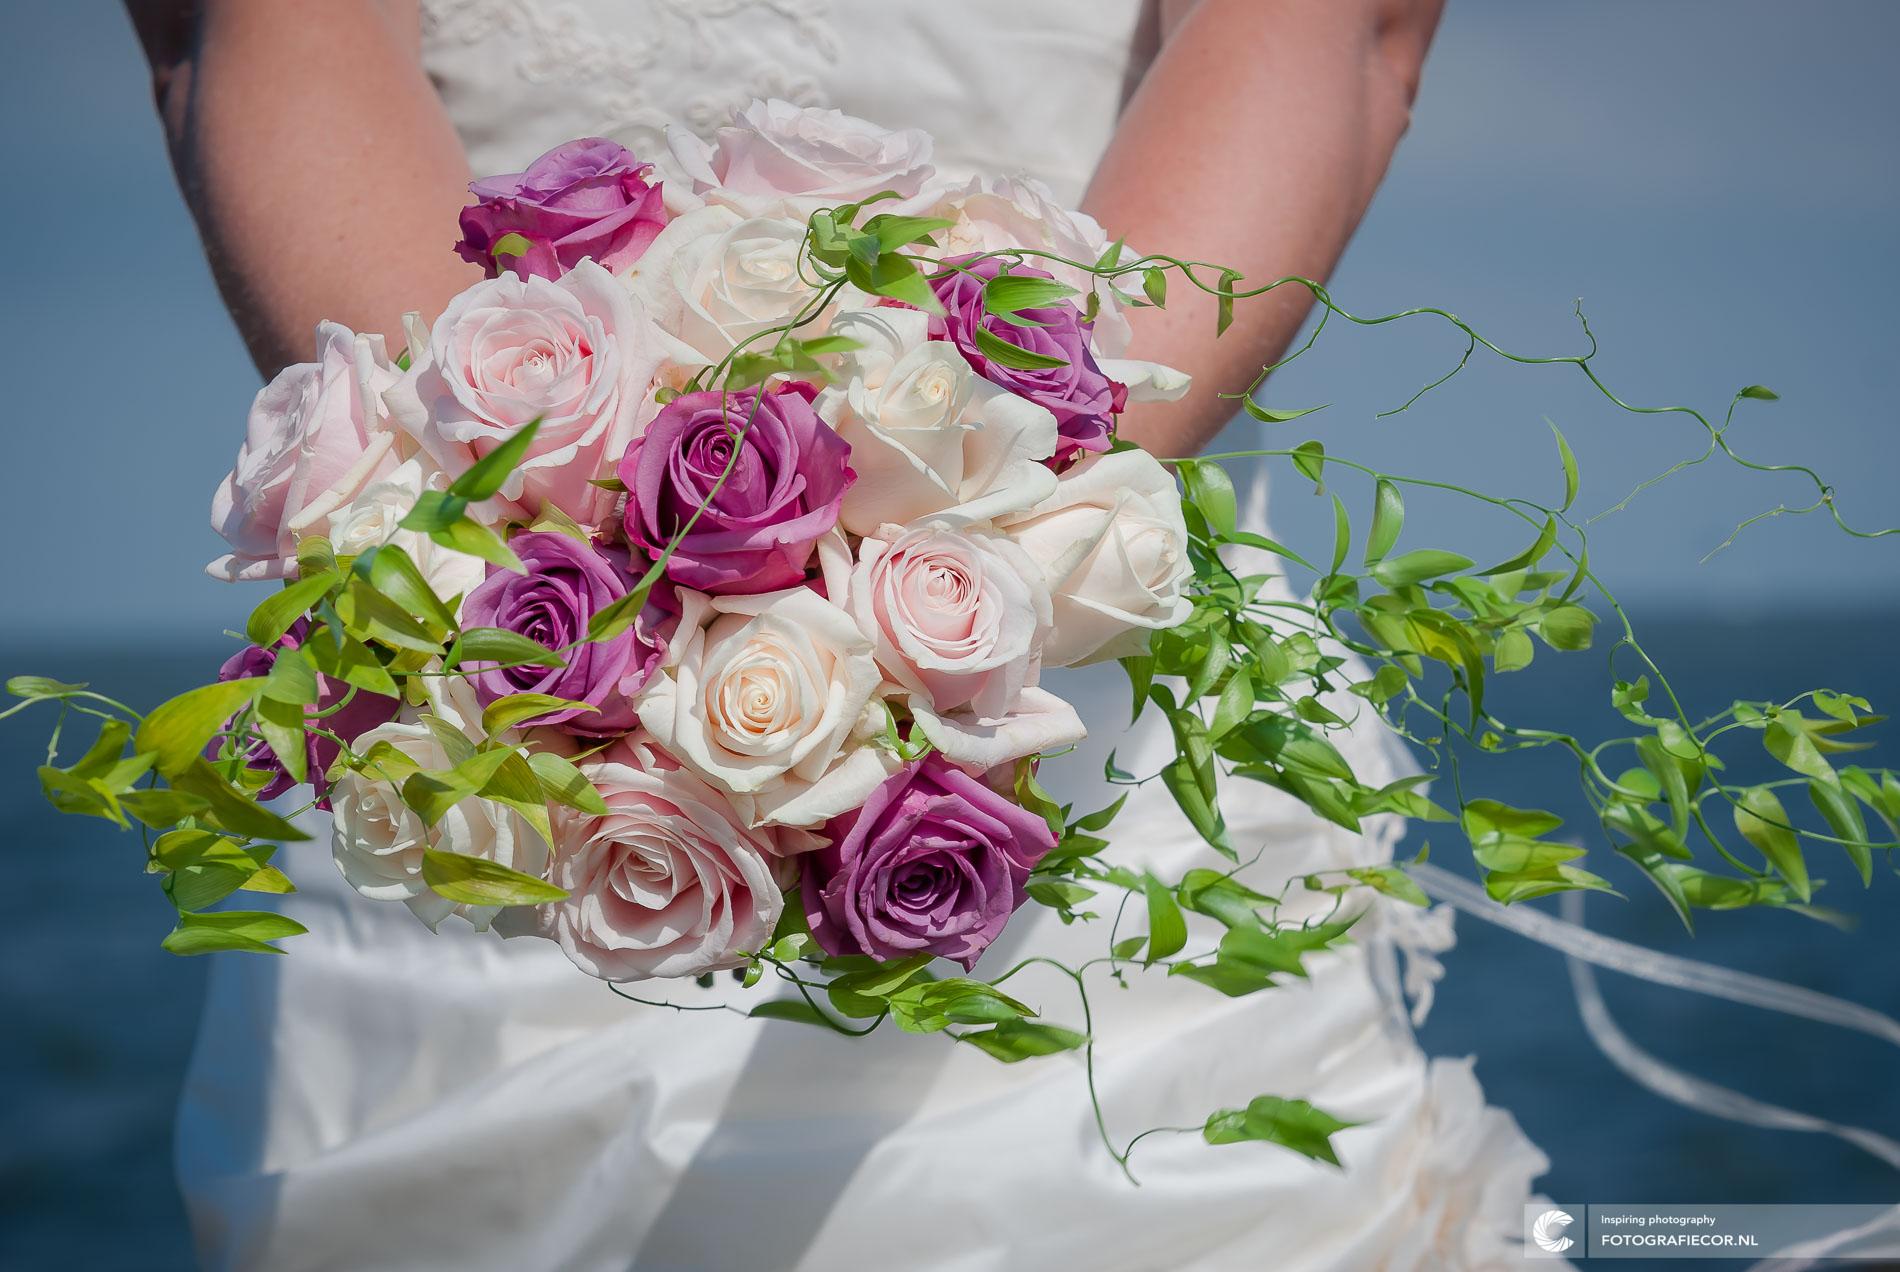 Trouwen   Bruidsfotografie   trouwfotograaf   trouwfoto's   shoot   portret   Mooiste dag